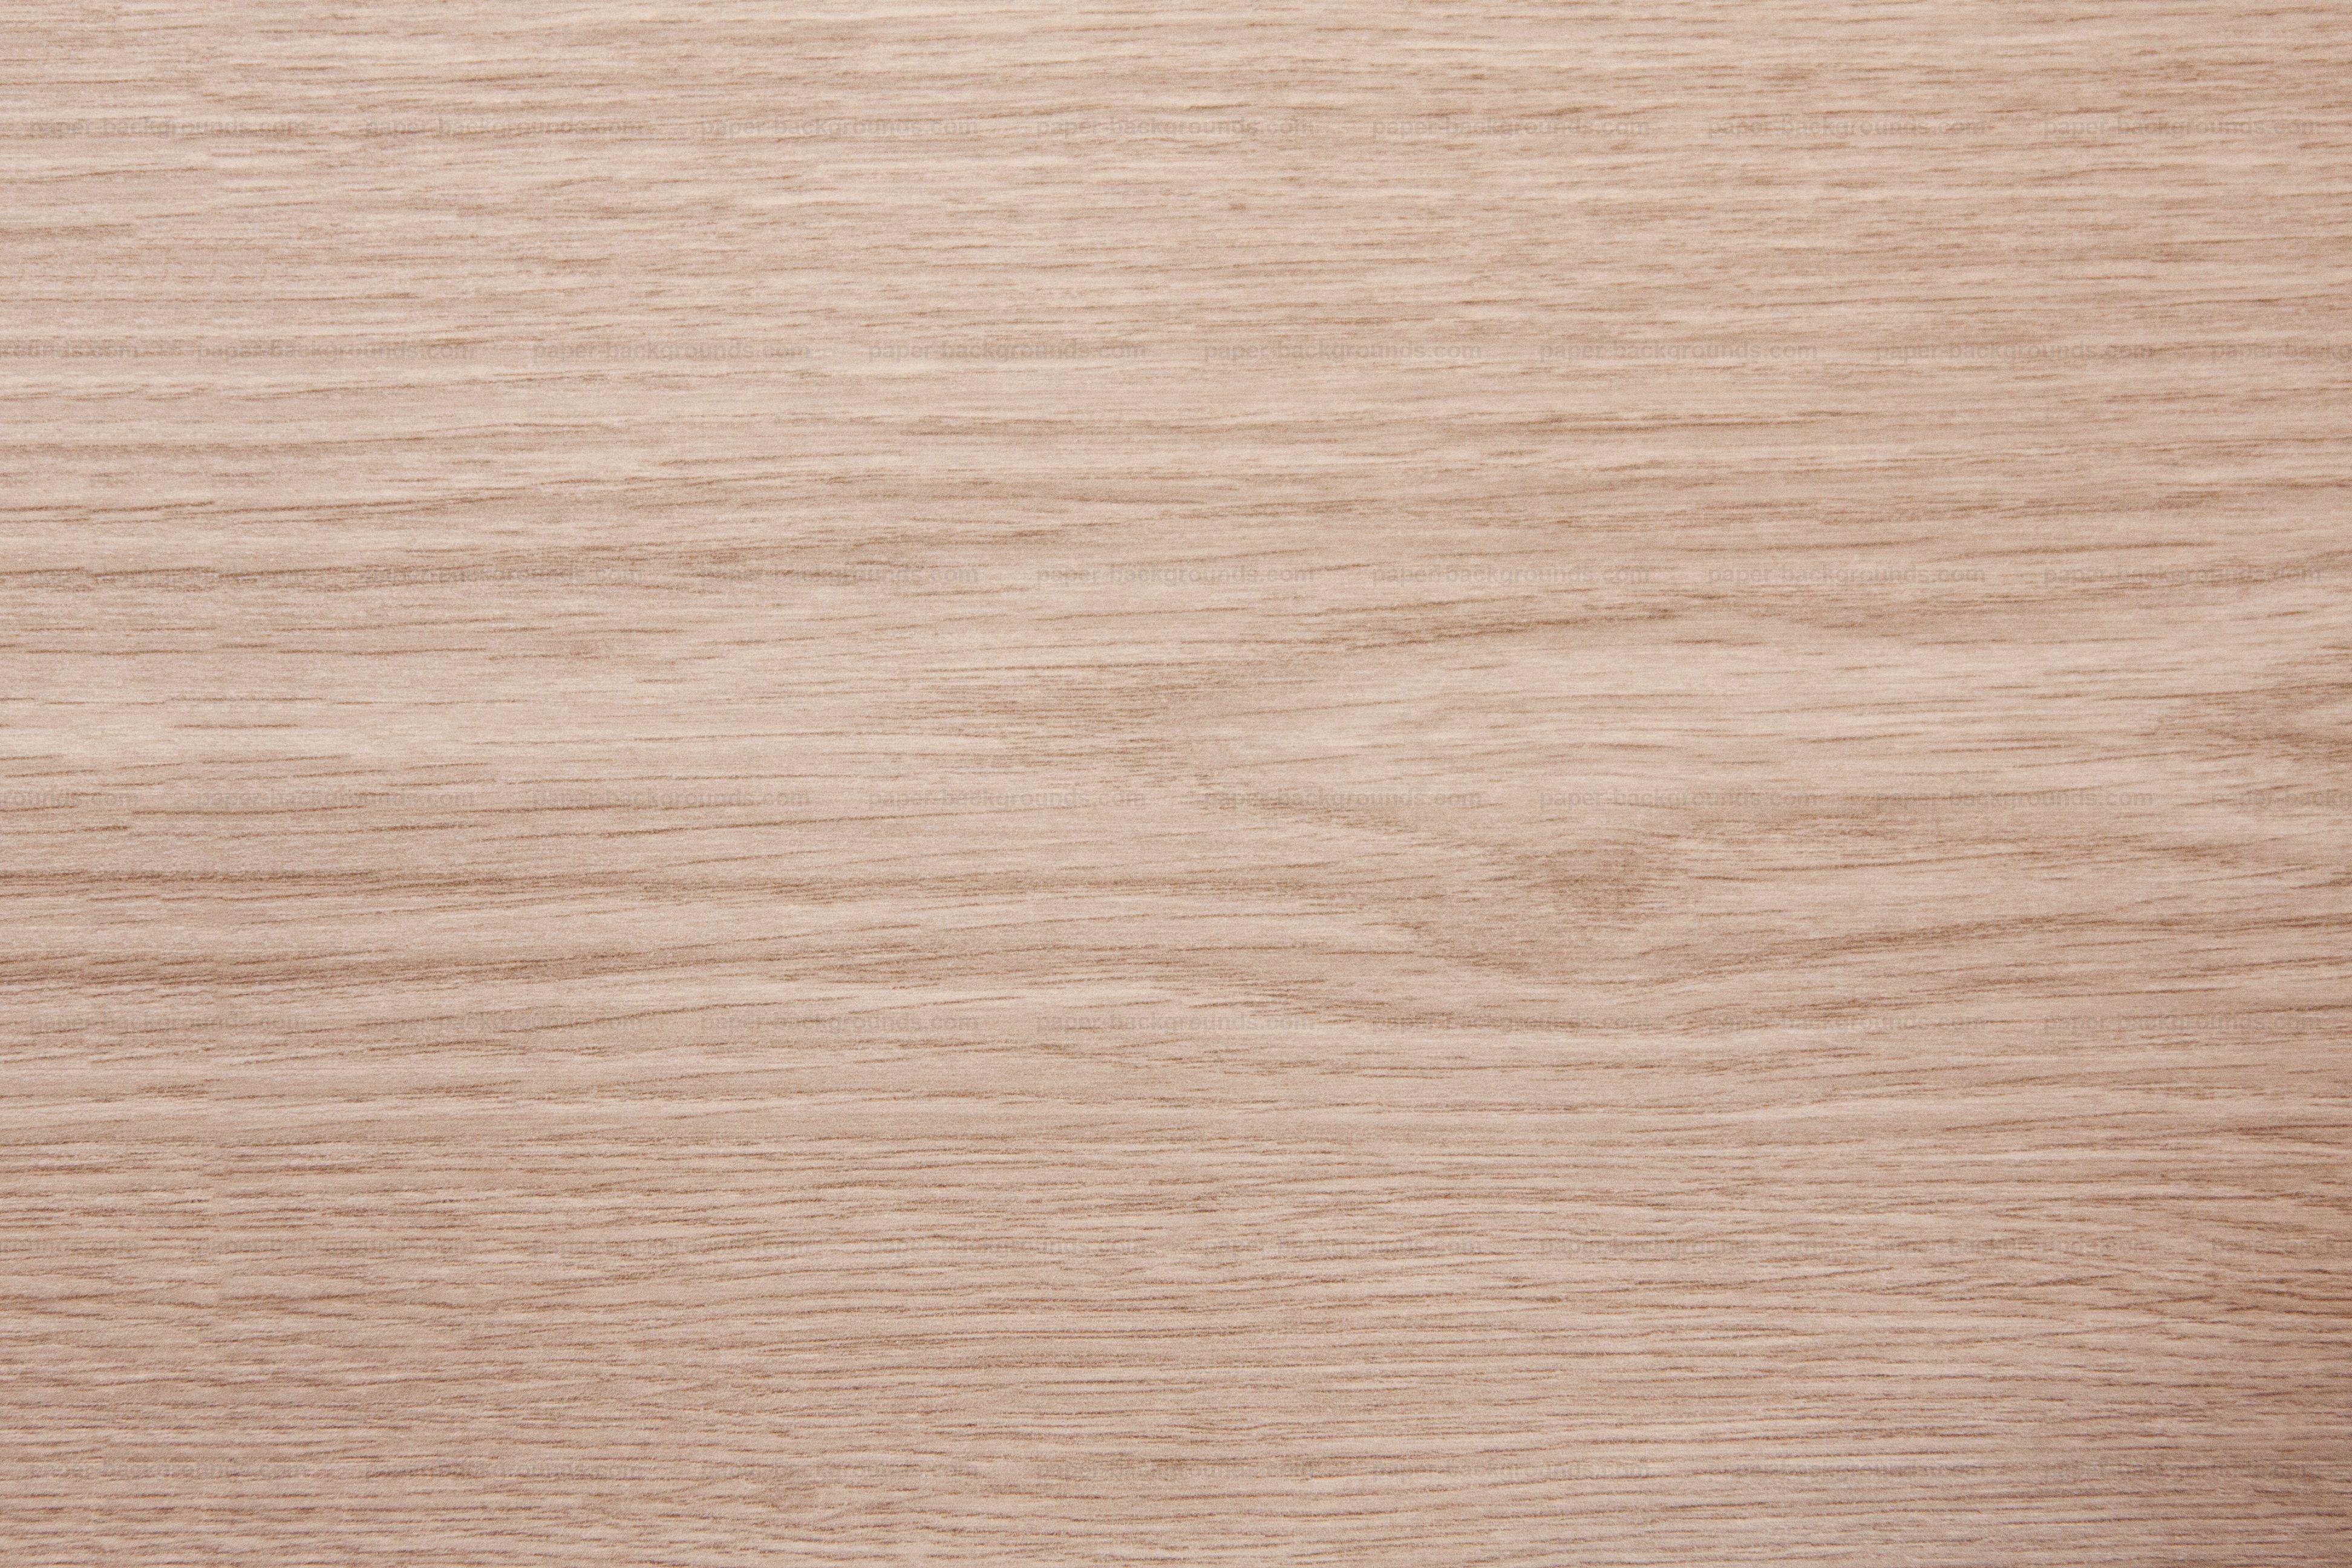 Light Brown Wood Furniture Texture Jpg 3888 2592